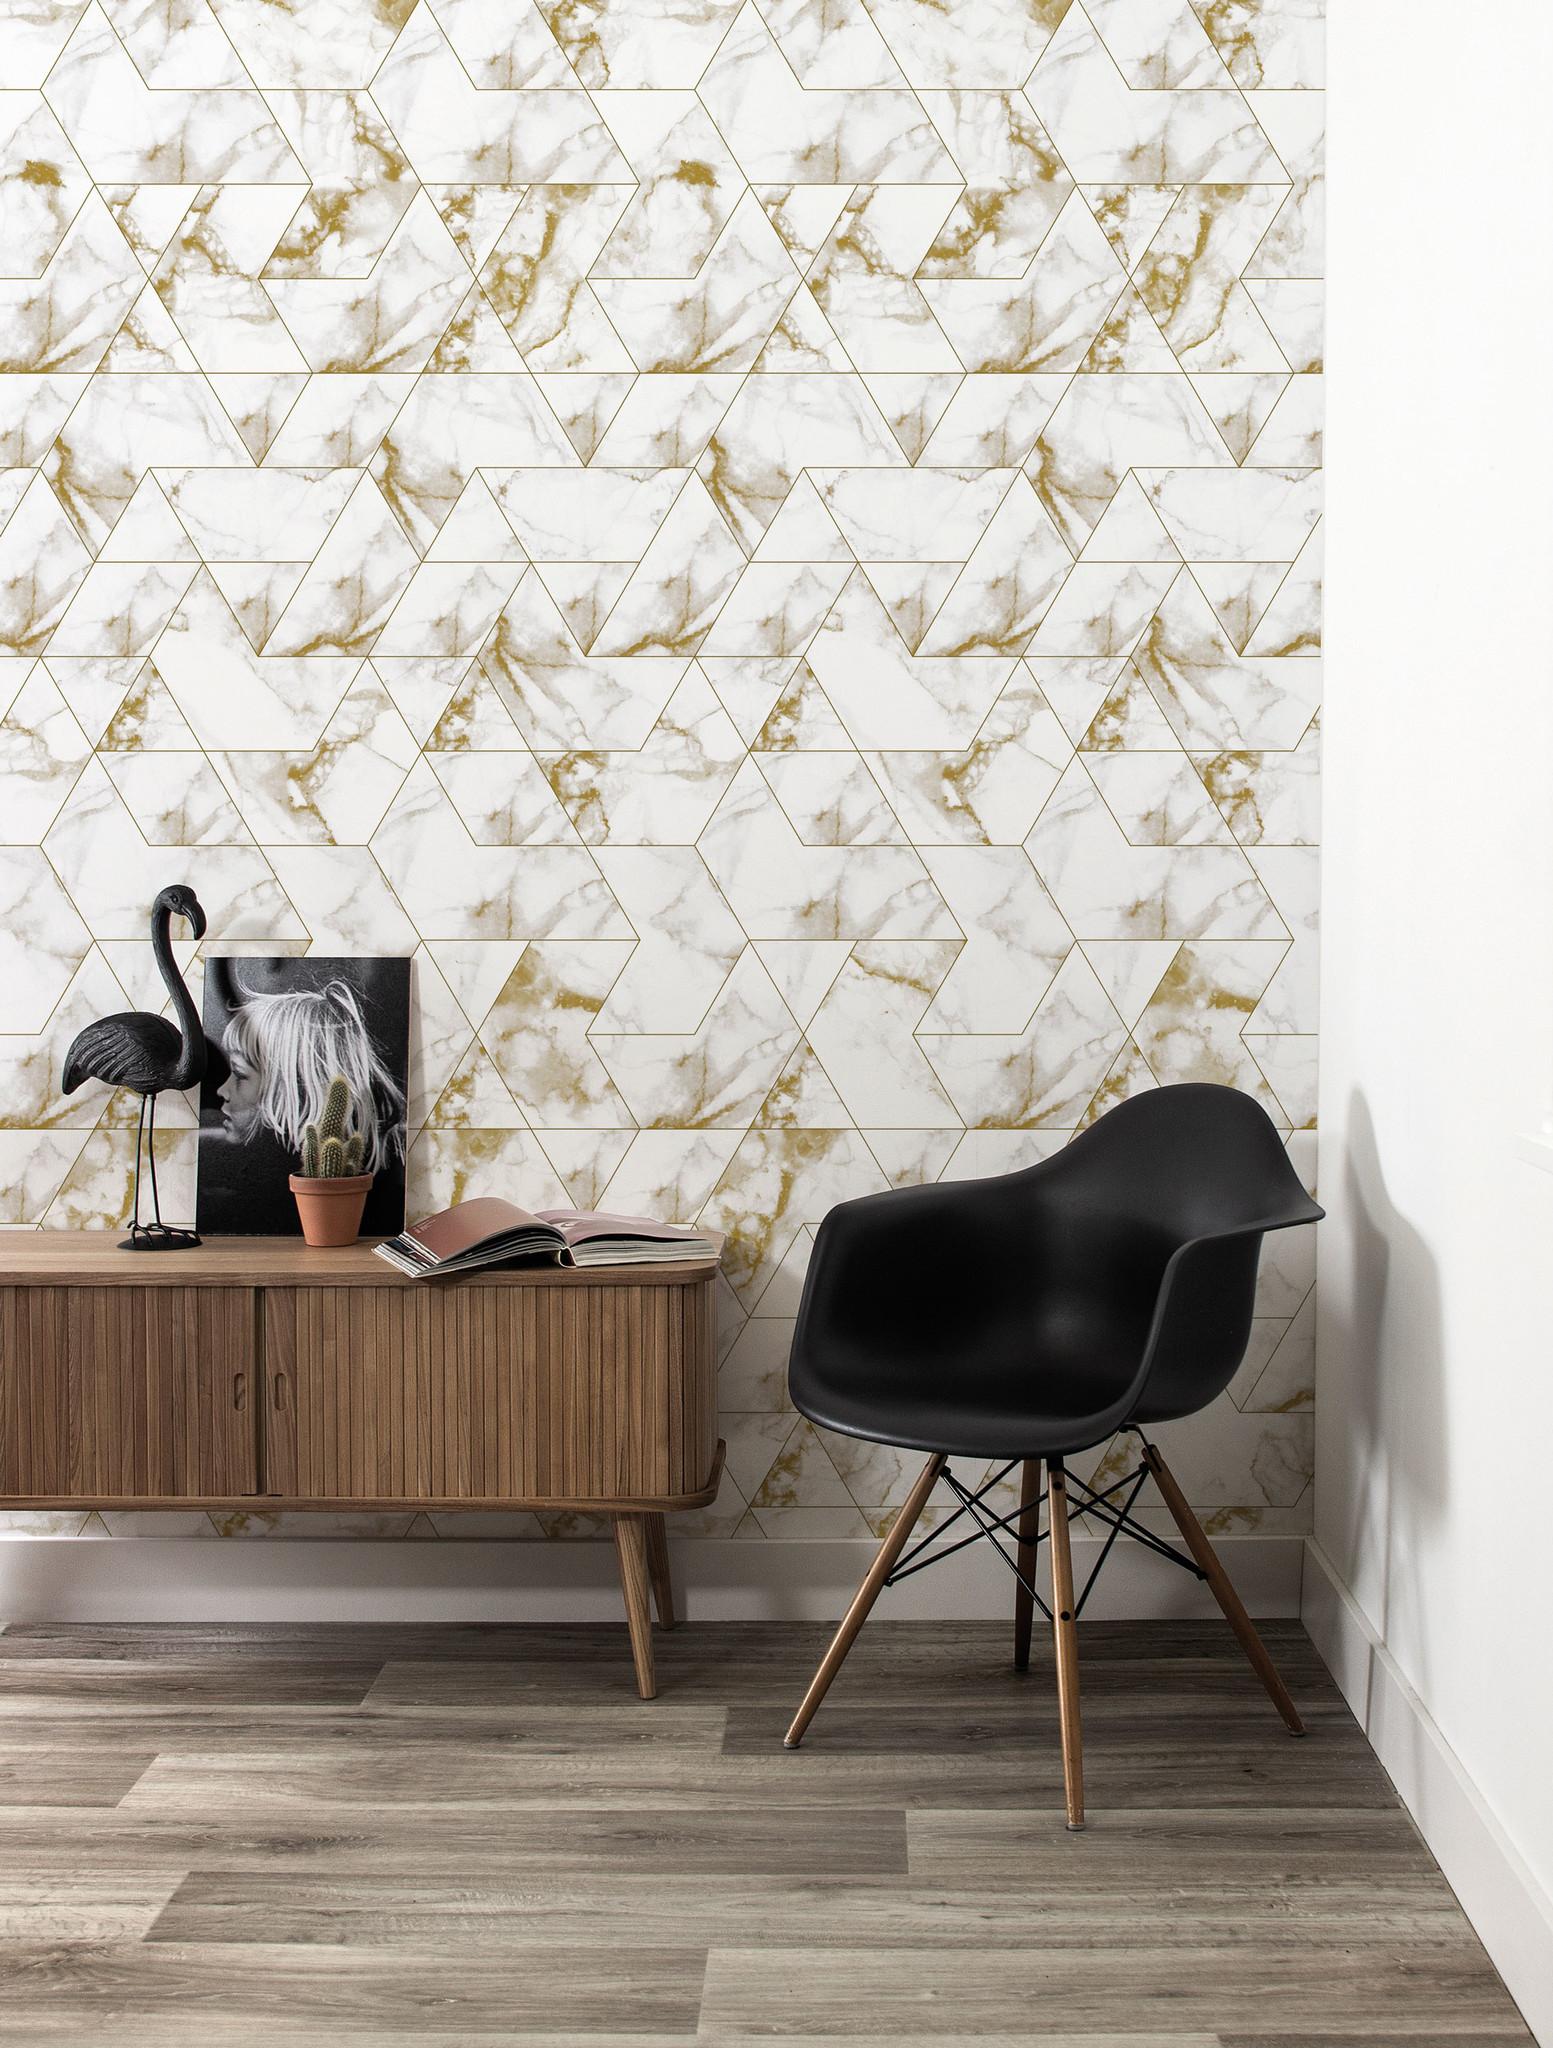 Behang Marmer Mosaic - 97.4 x 280 wit-goud-3